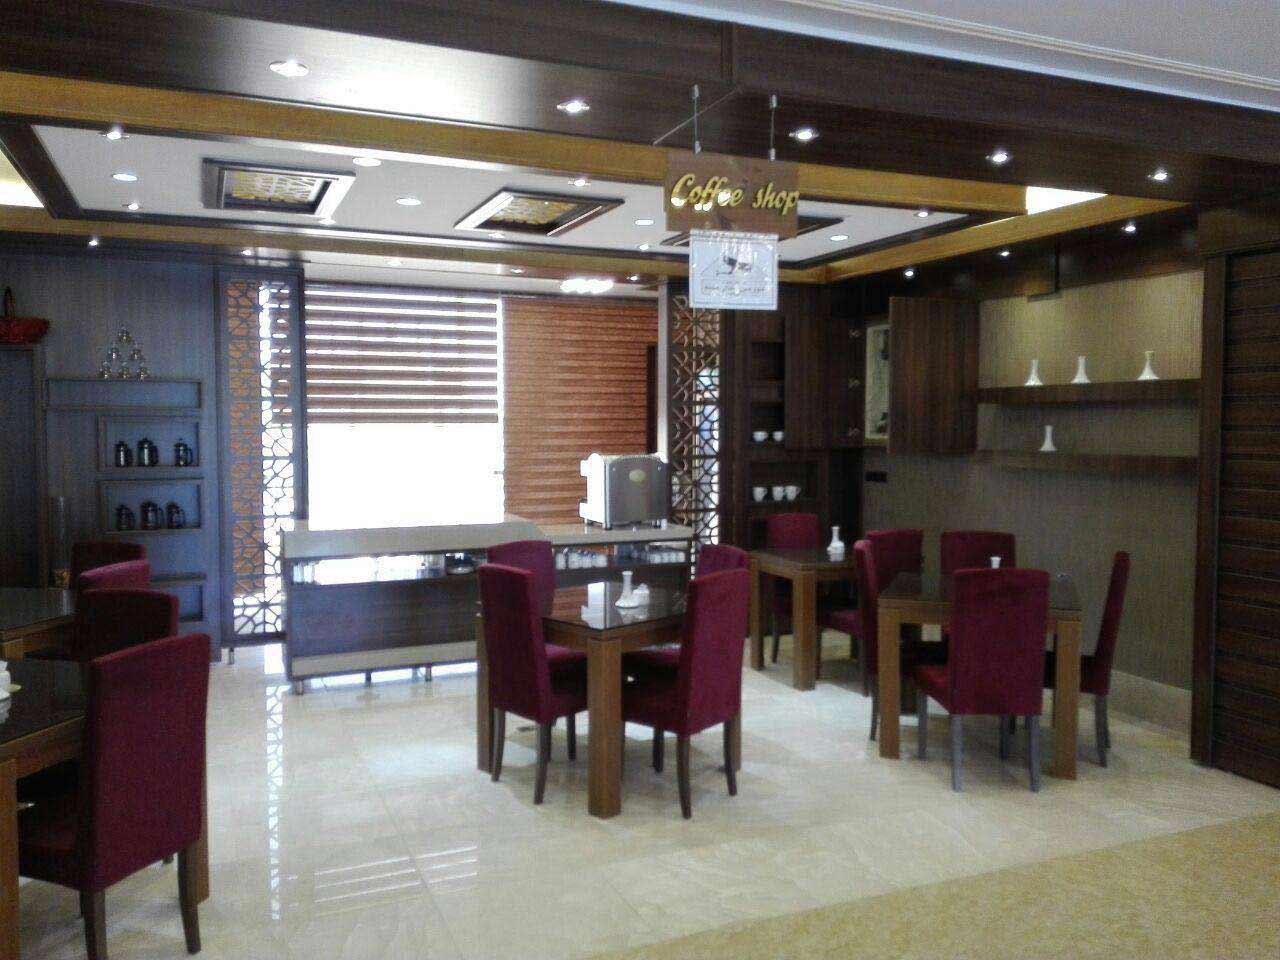 Shahed Hotel in Qom